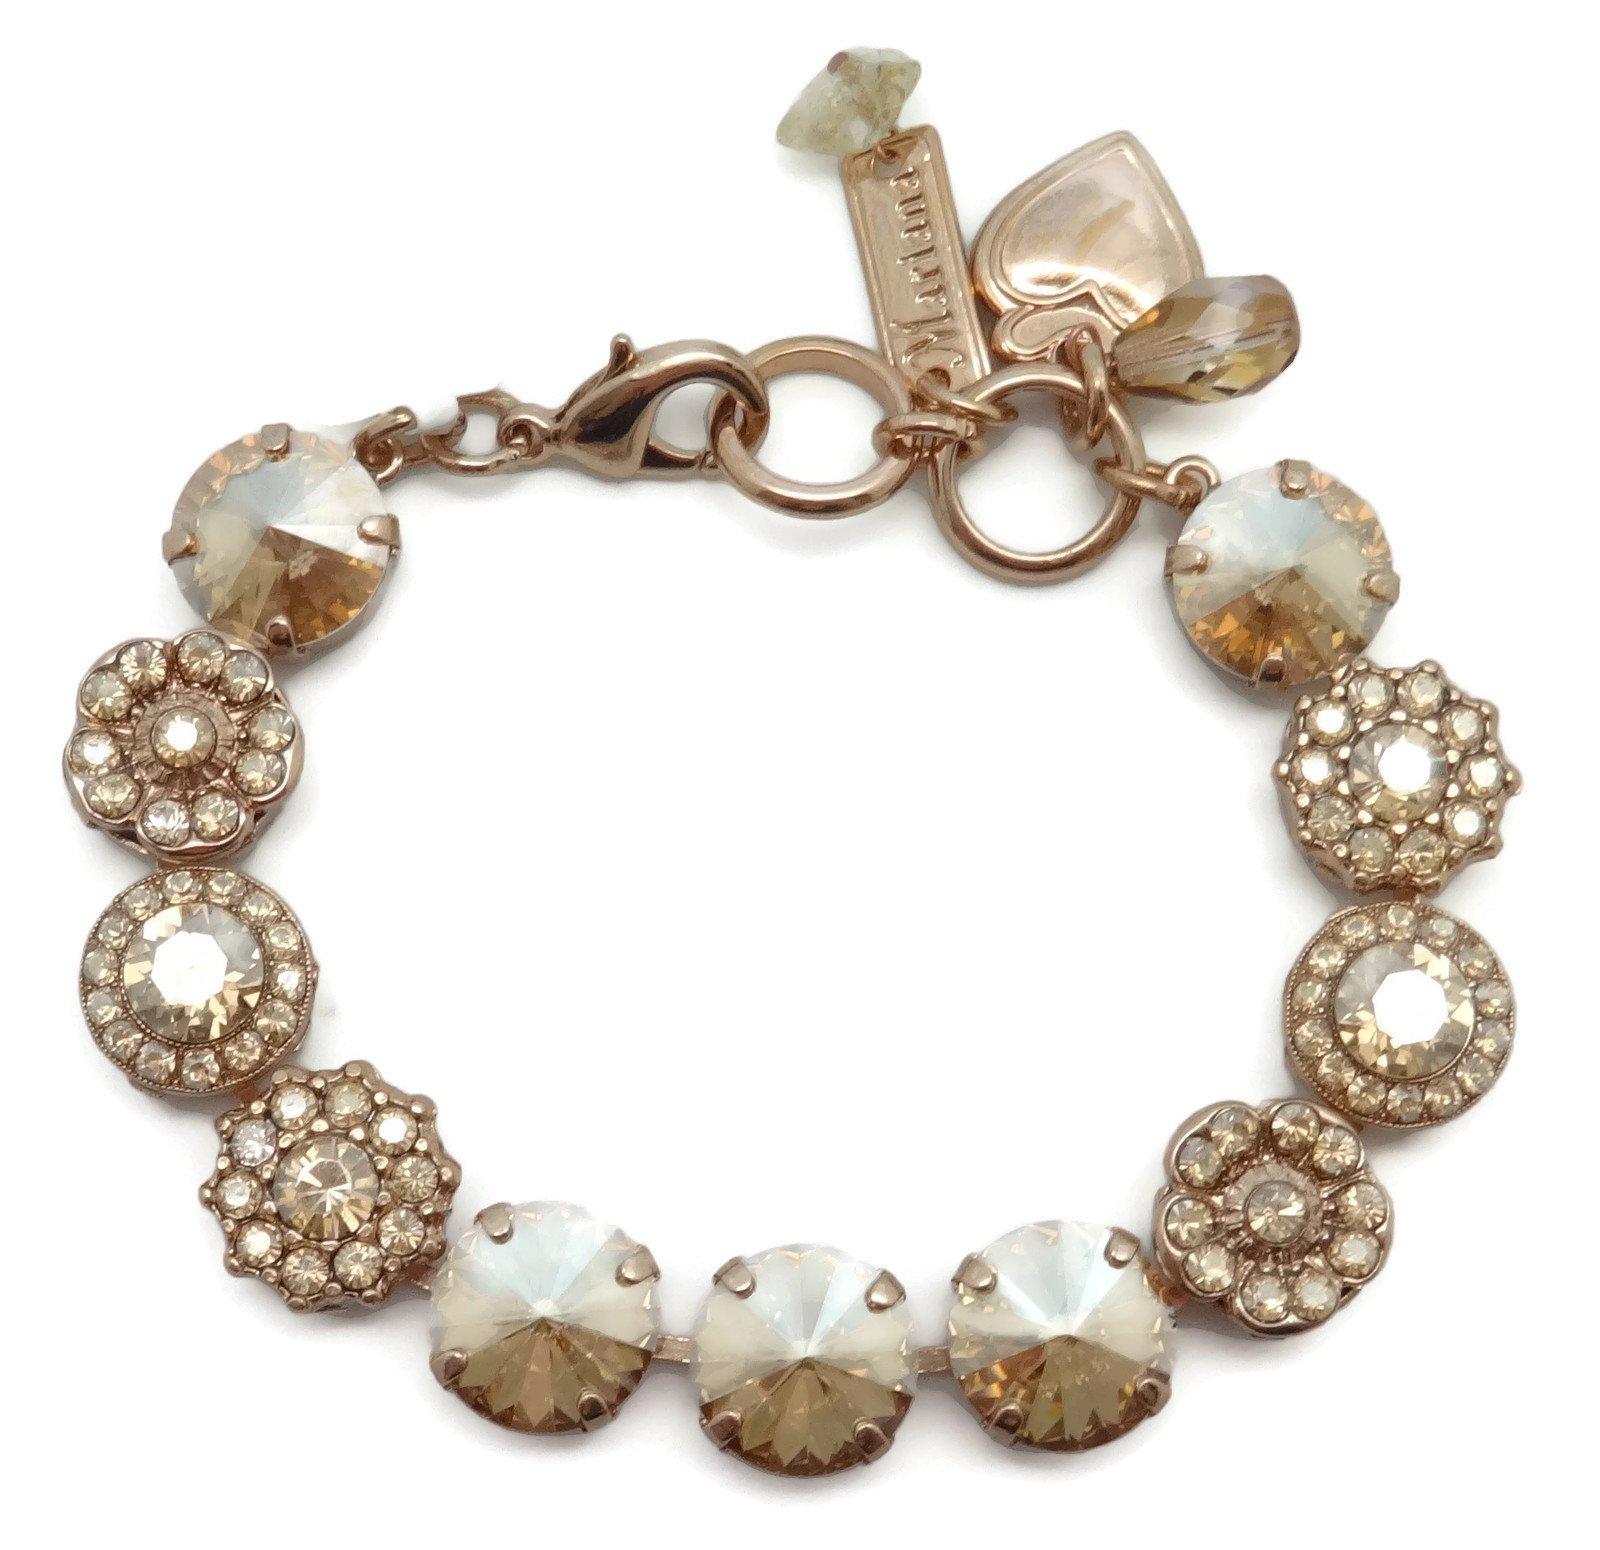 Mariana Swarovski Crystal Rose Gold Plated Bracelet Golden Shadow Flower Mosaic 216216